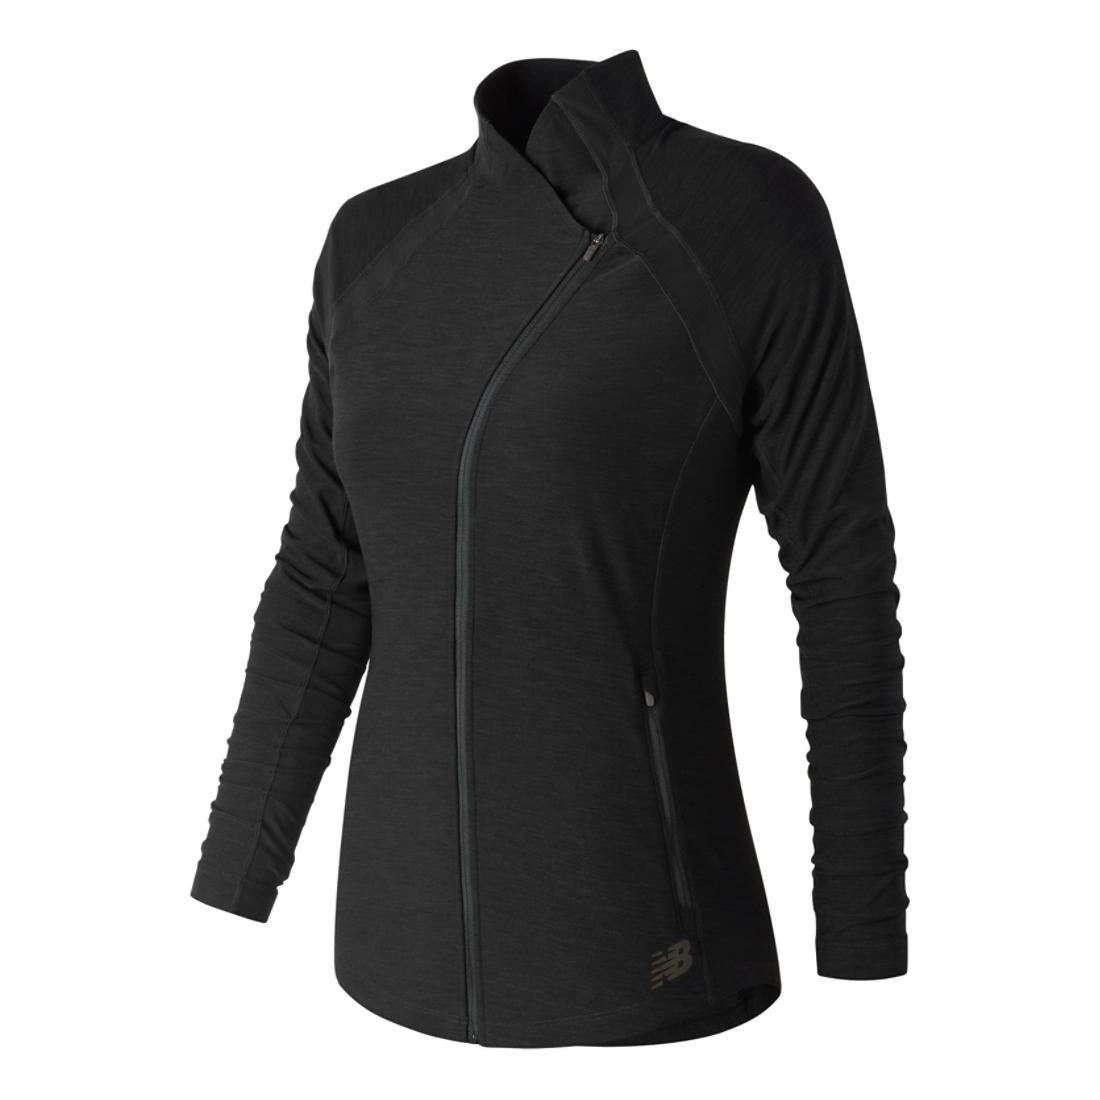 New Balance Women's Anticipate Jacket, Black, X-Small